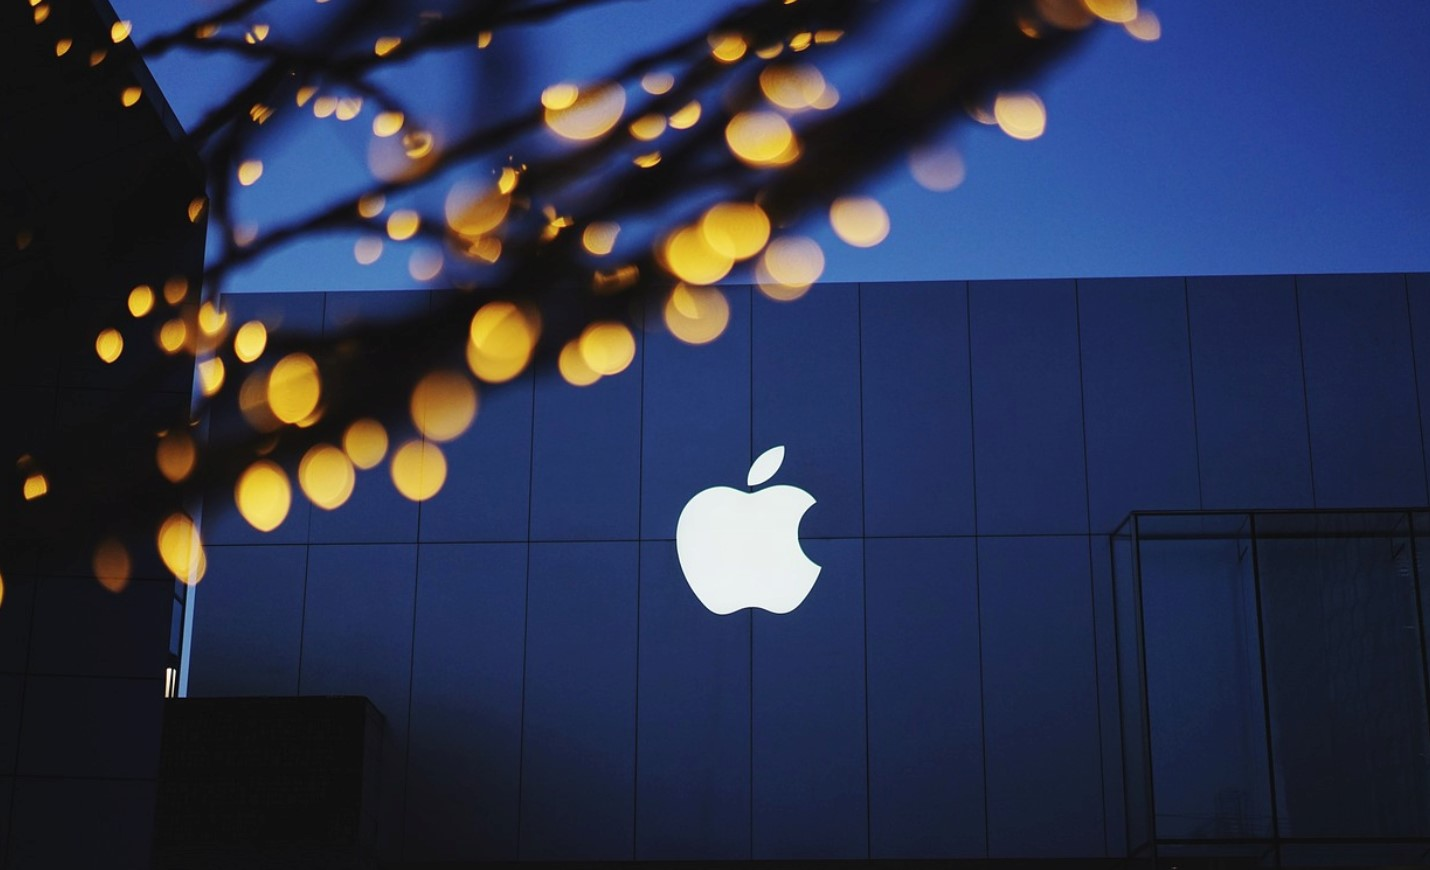 iPhone 2020 iPhone 2020 - iPhone 2020 có thể sẽ có logo phát sáng